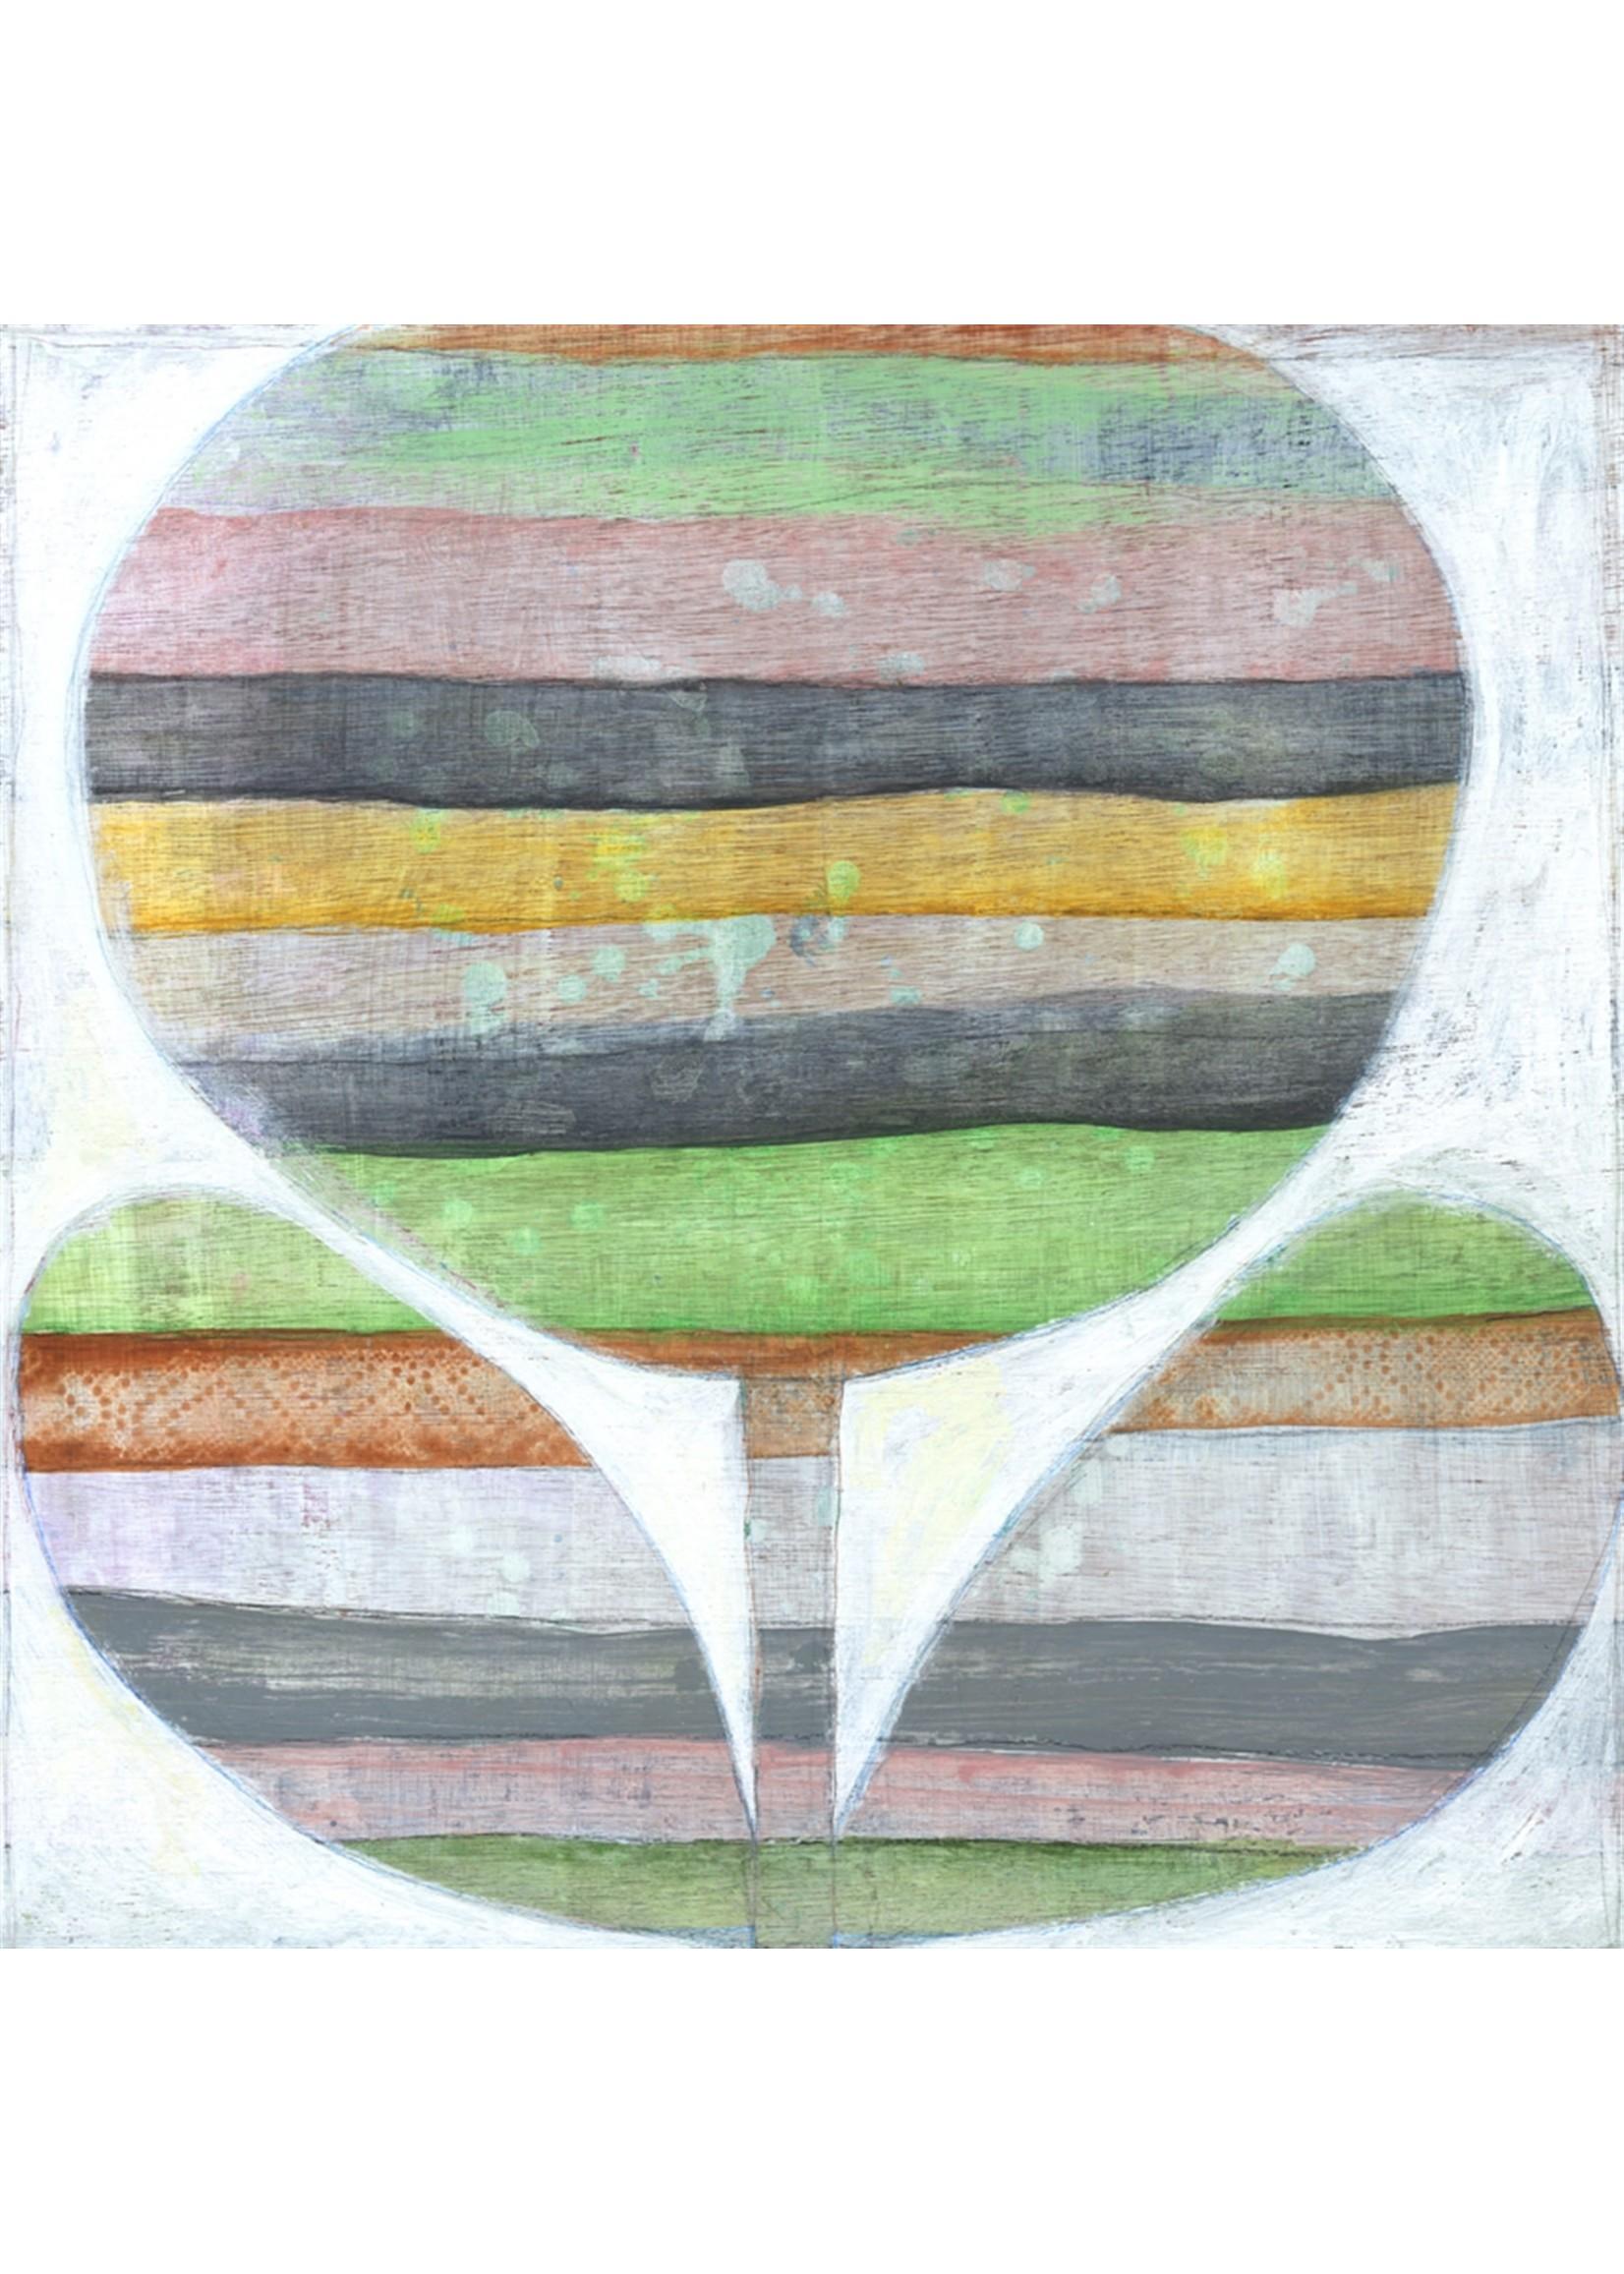 Emerson's Flower 12x12